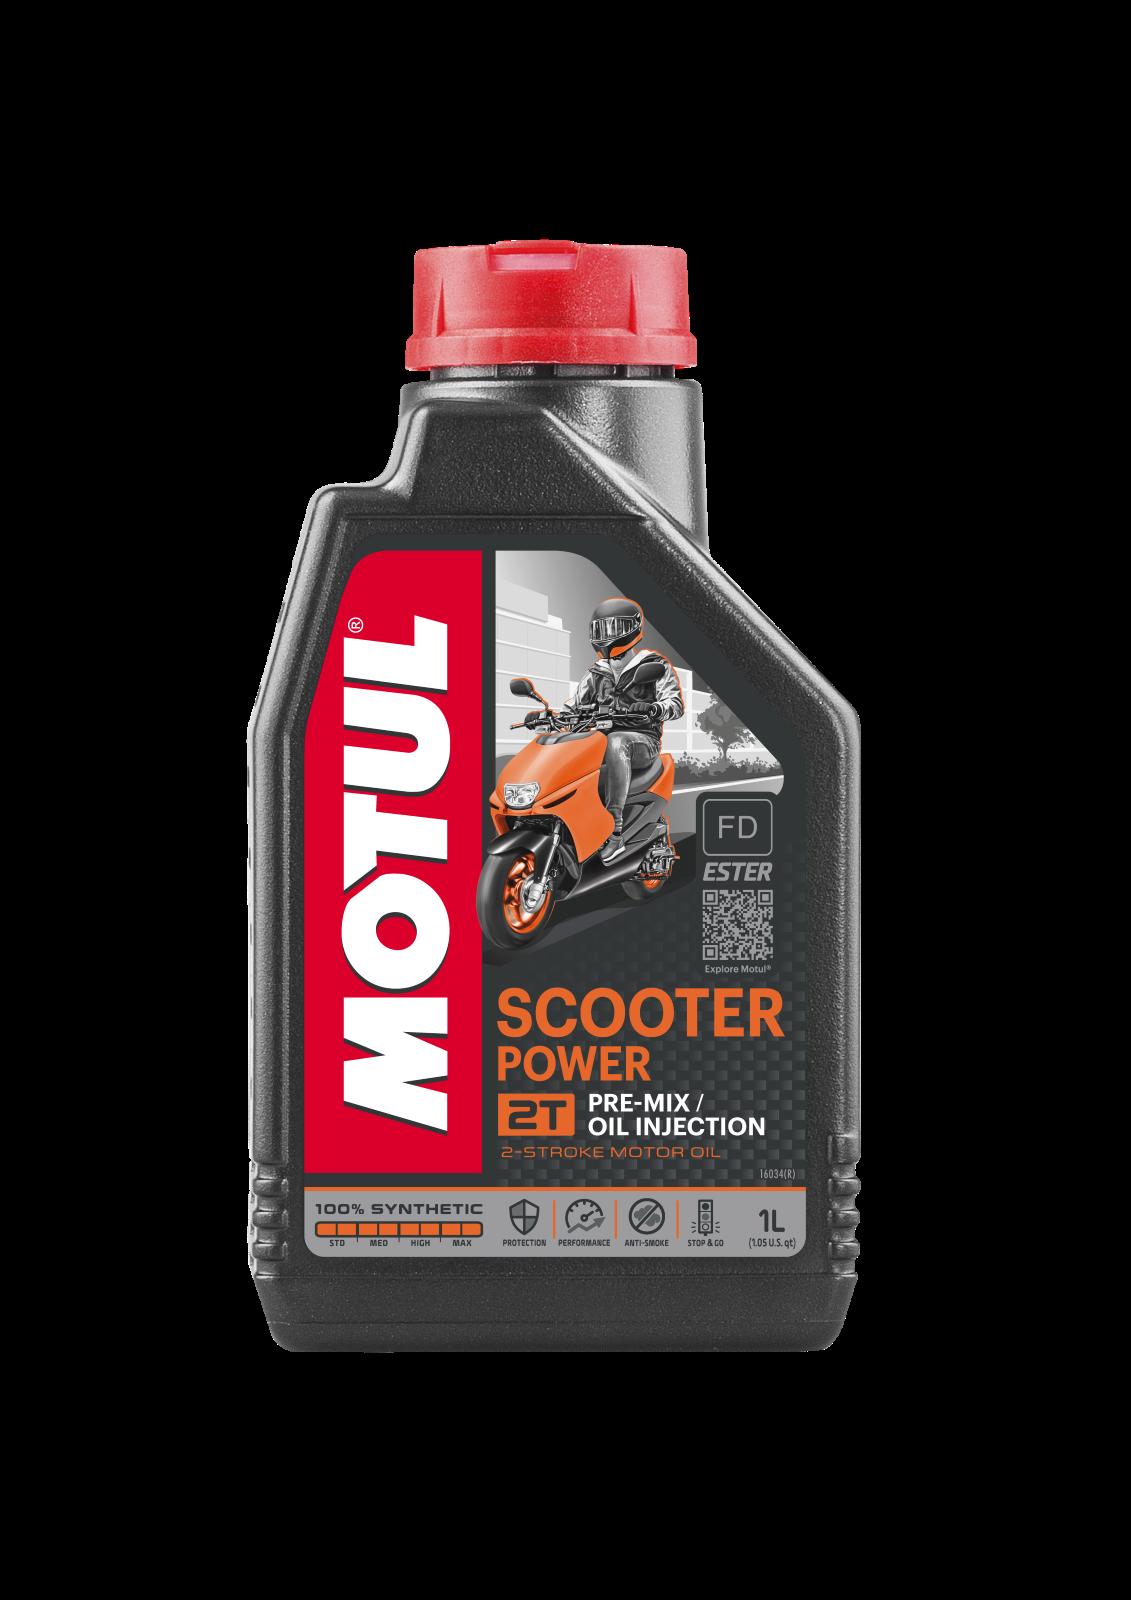 MOTUL AG MOTUL Scooter Power 2T 1L